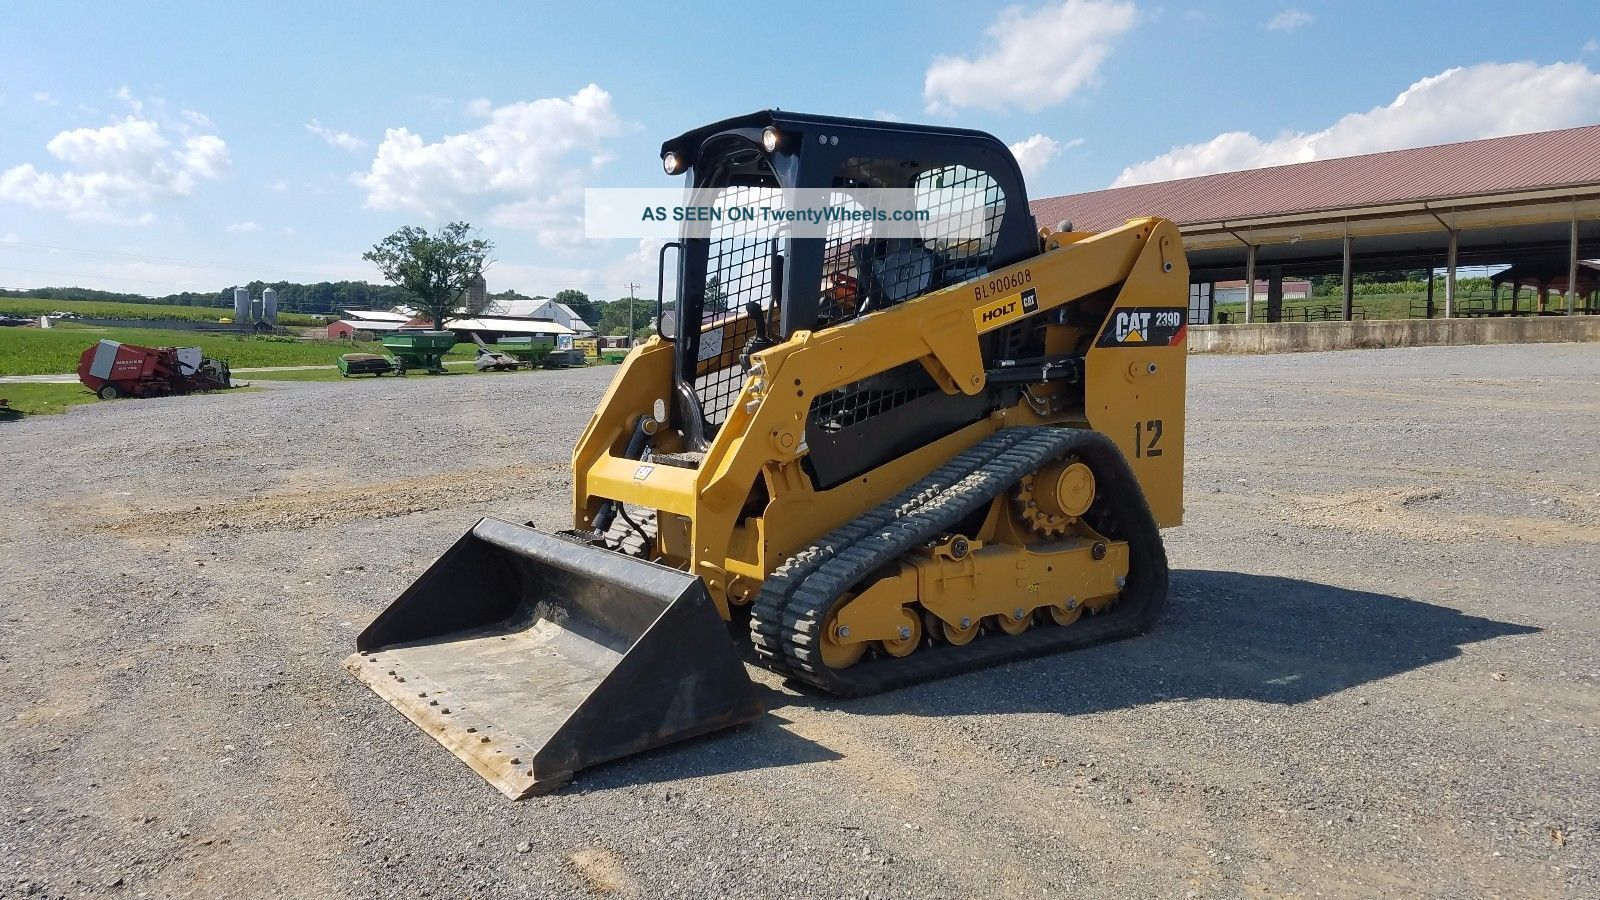 2015 Caterpillar 239d Compact Track Loader Cat Diesel Engine Orops 80 Skid Steer Loaders photo